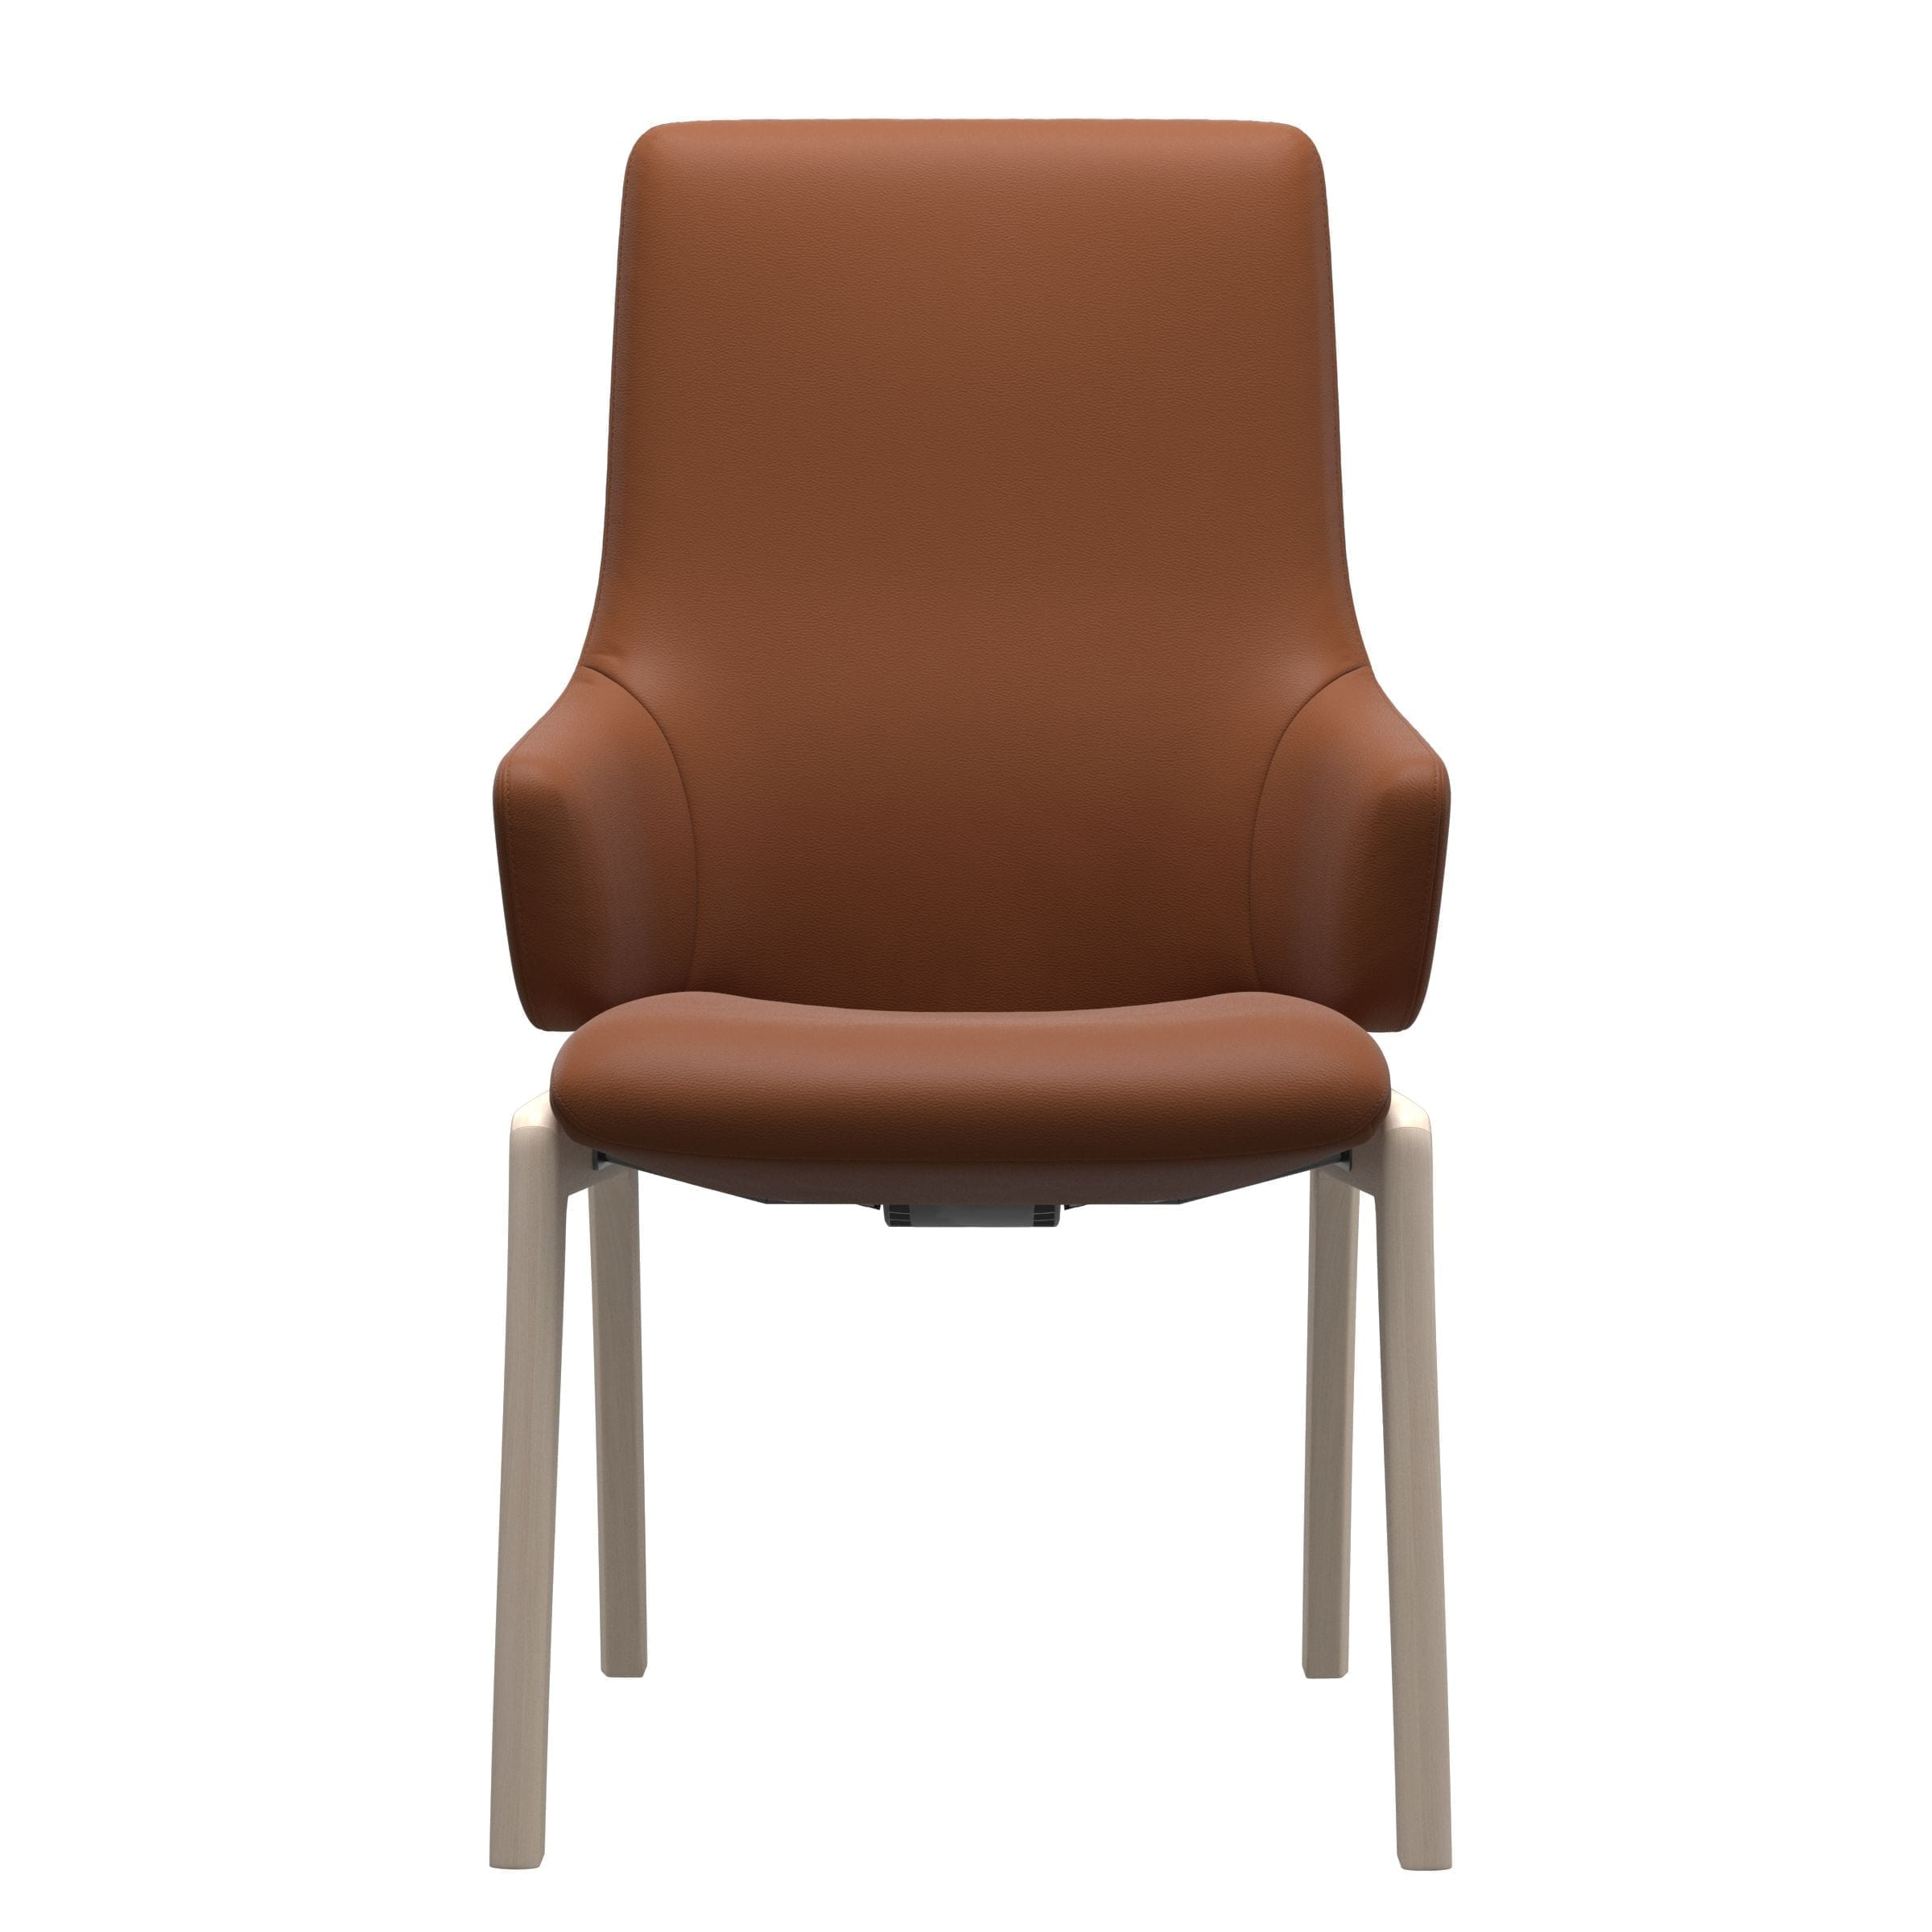 Laurel High Back D100 Stressless Dining Chair